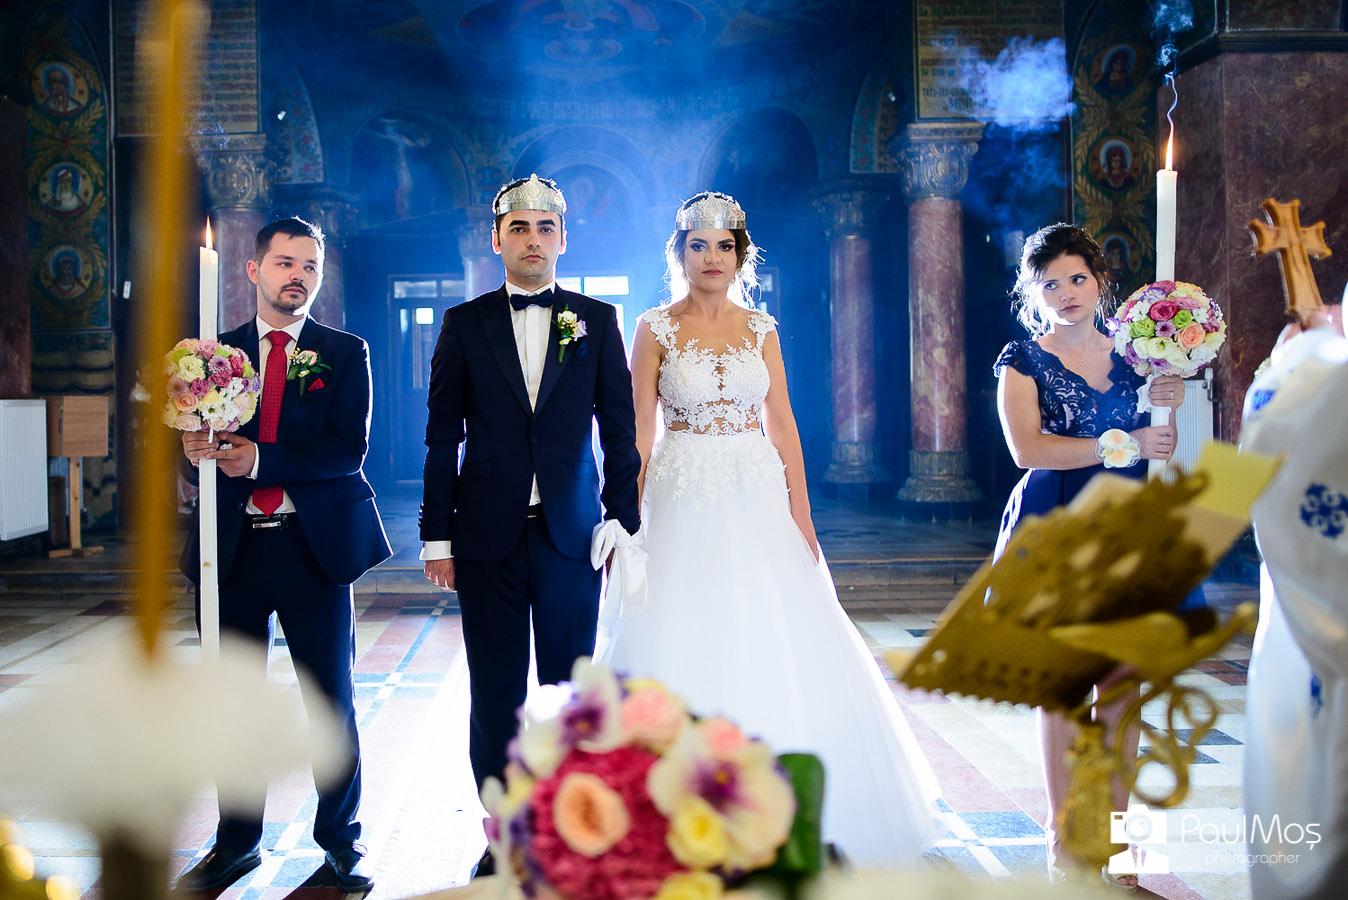 Fotograf nuntă Reșita, Fotografii nunta, foto video nunta, fotograf profesionist resita